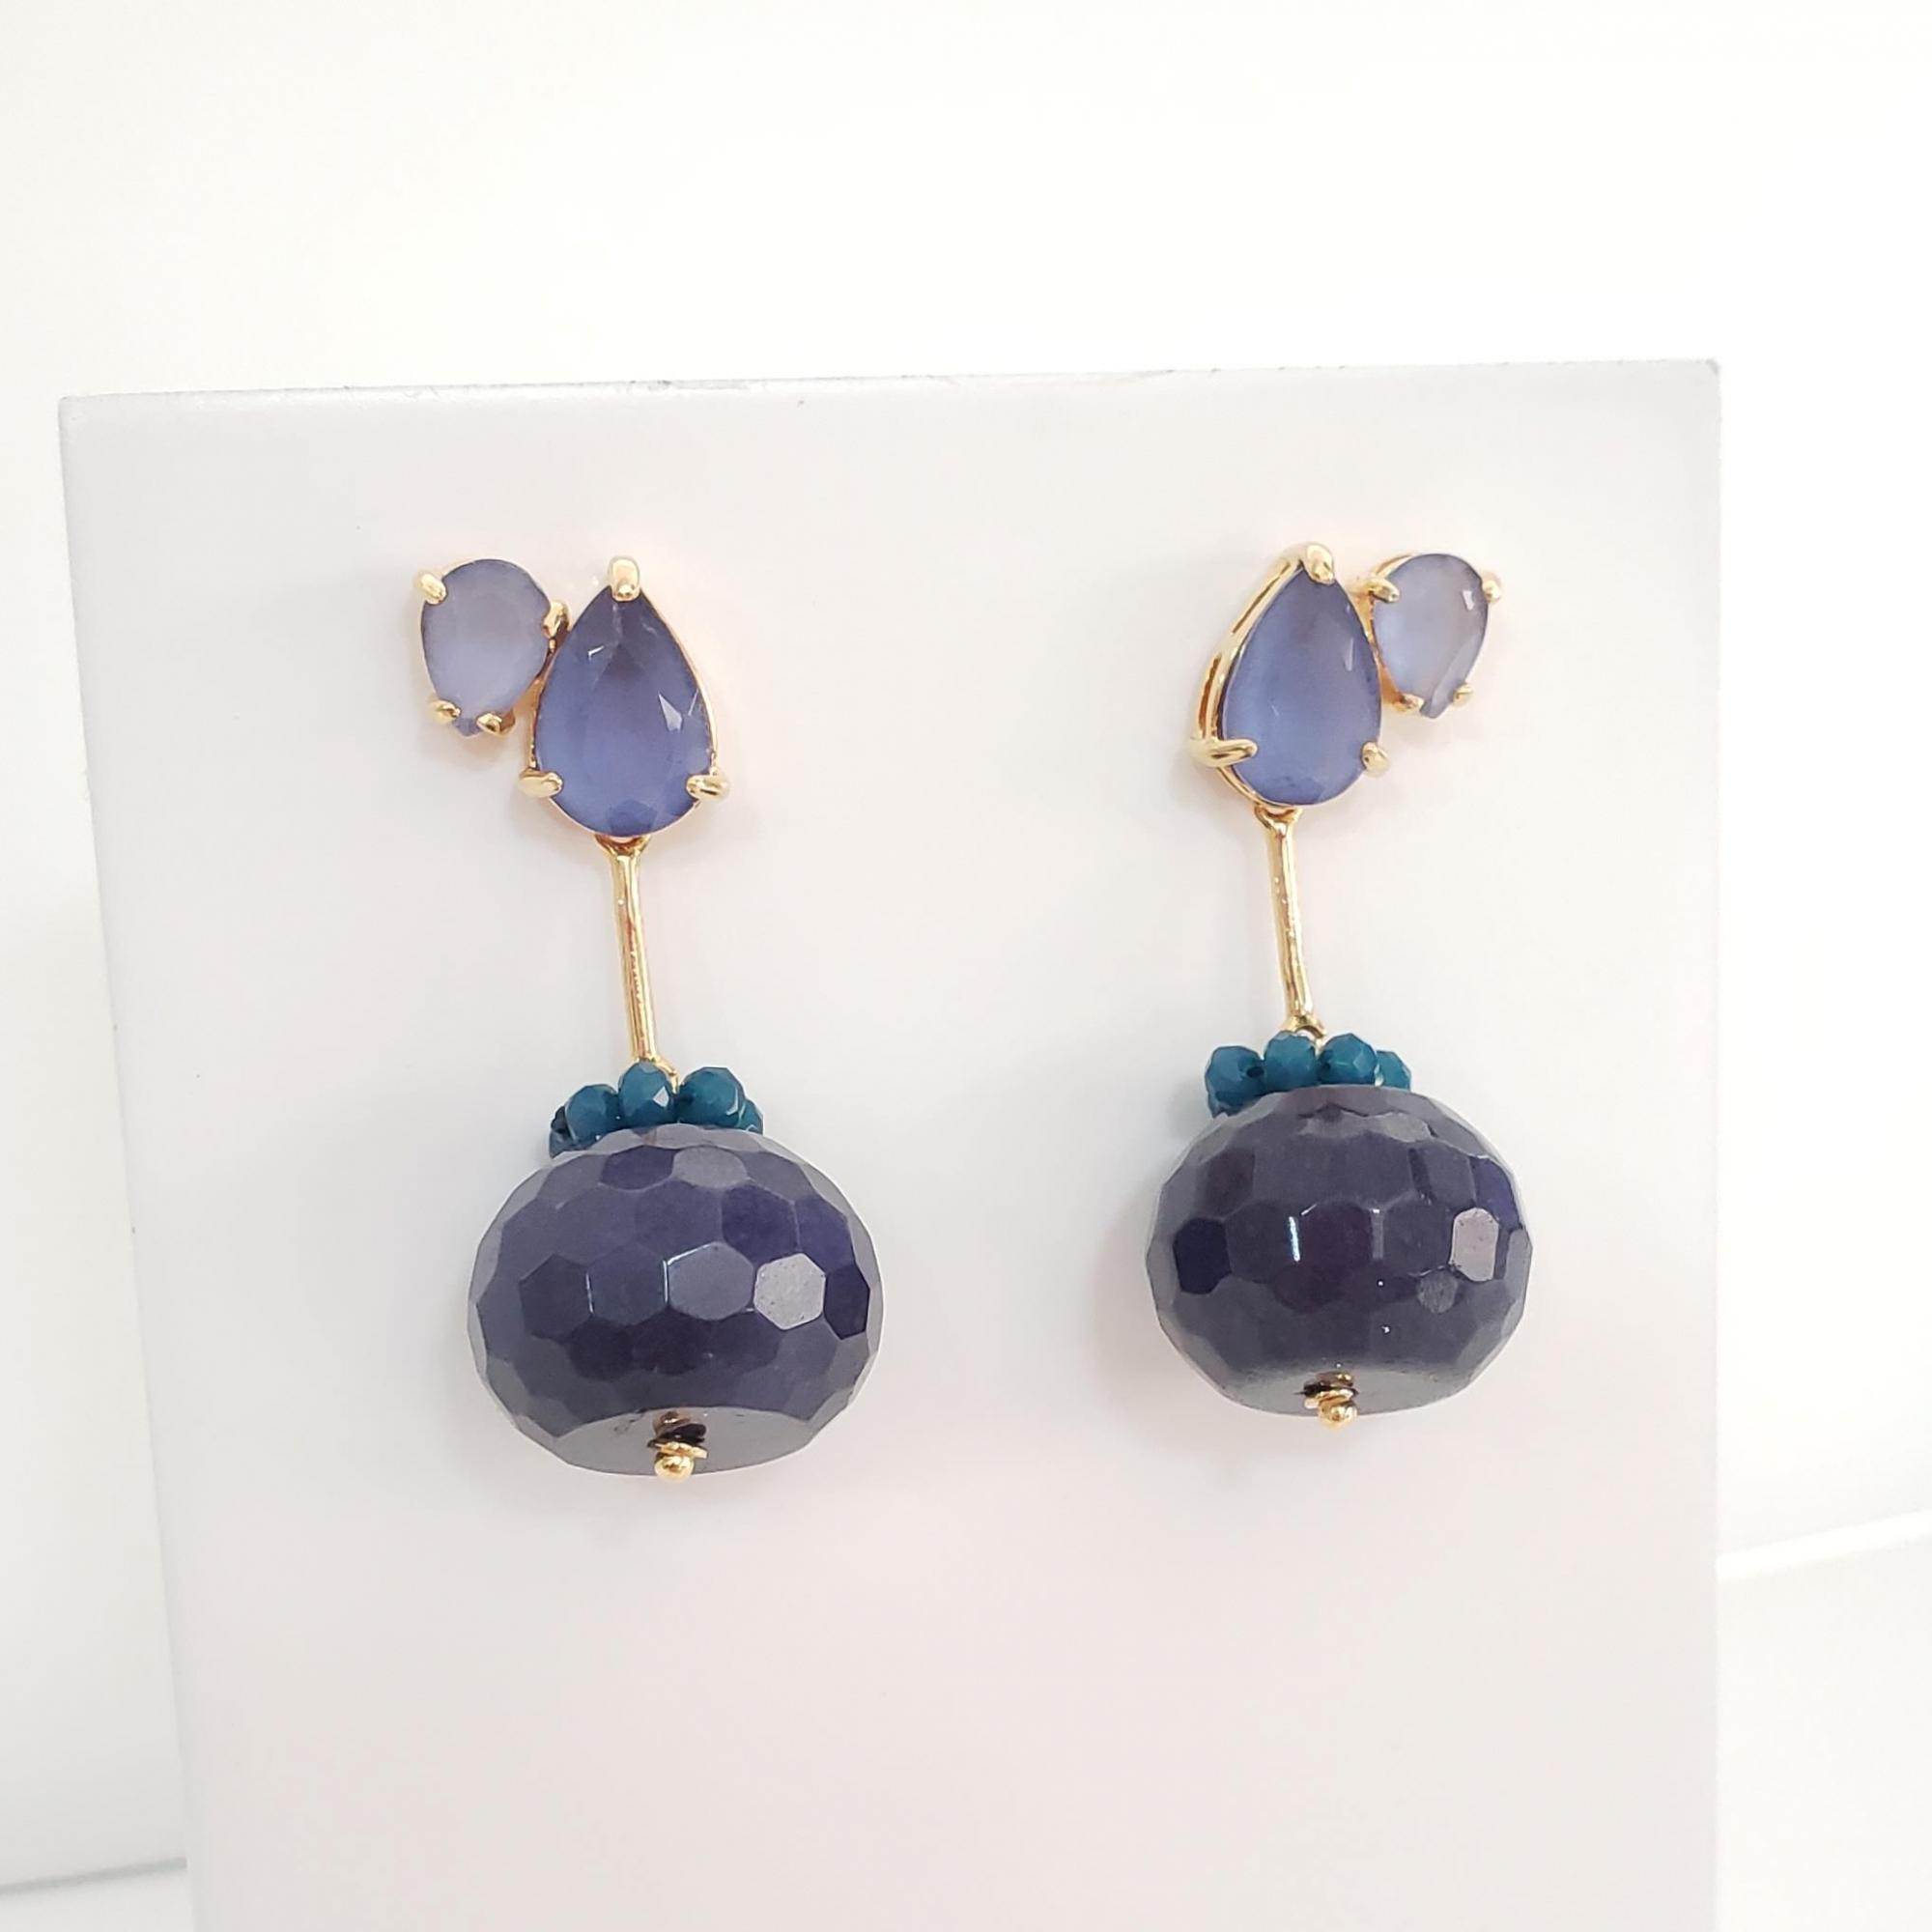 Brinco Duo Gotas Cristal Tanzanita, Coroinha Cristal Safira e Rondel Jade Safira no Banho Ouro 18k Semi Joia